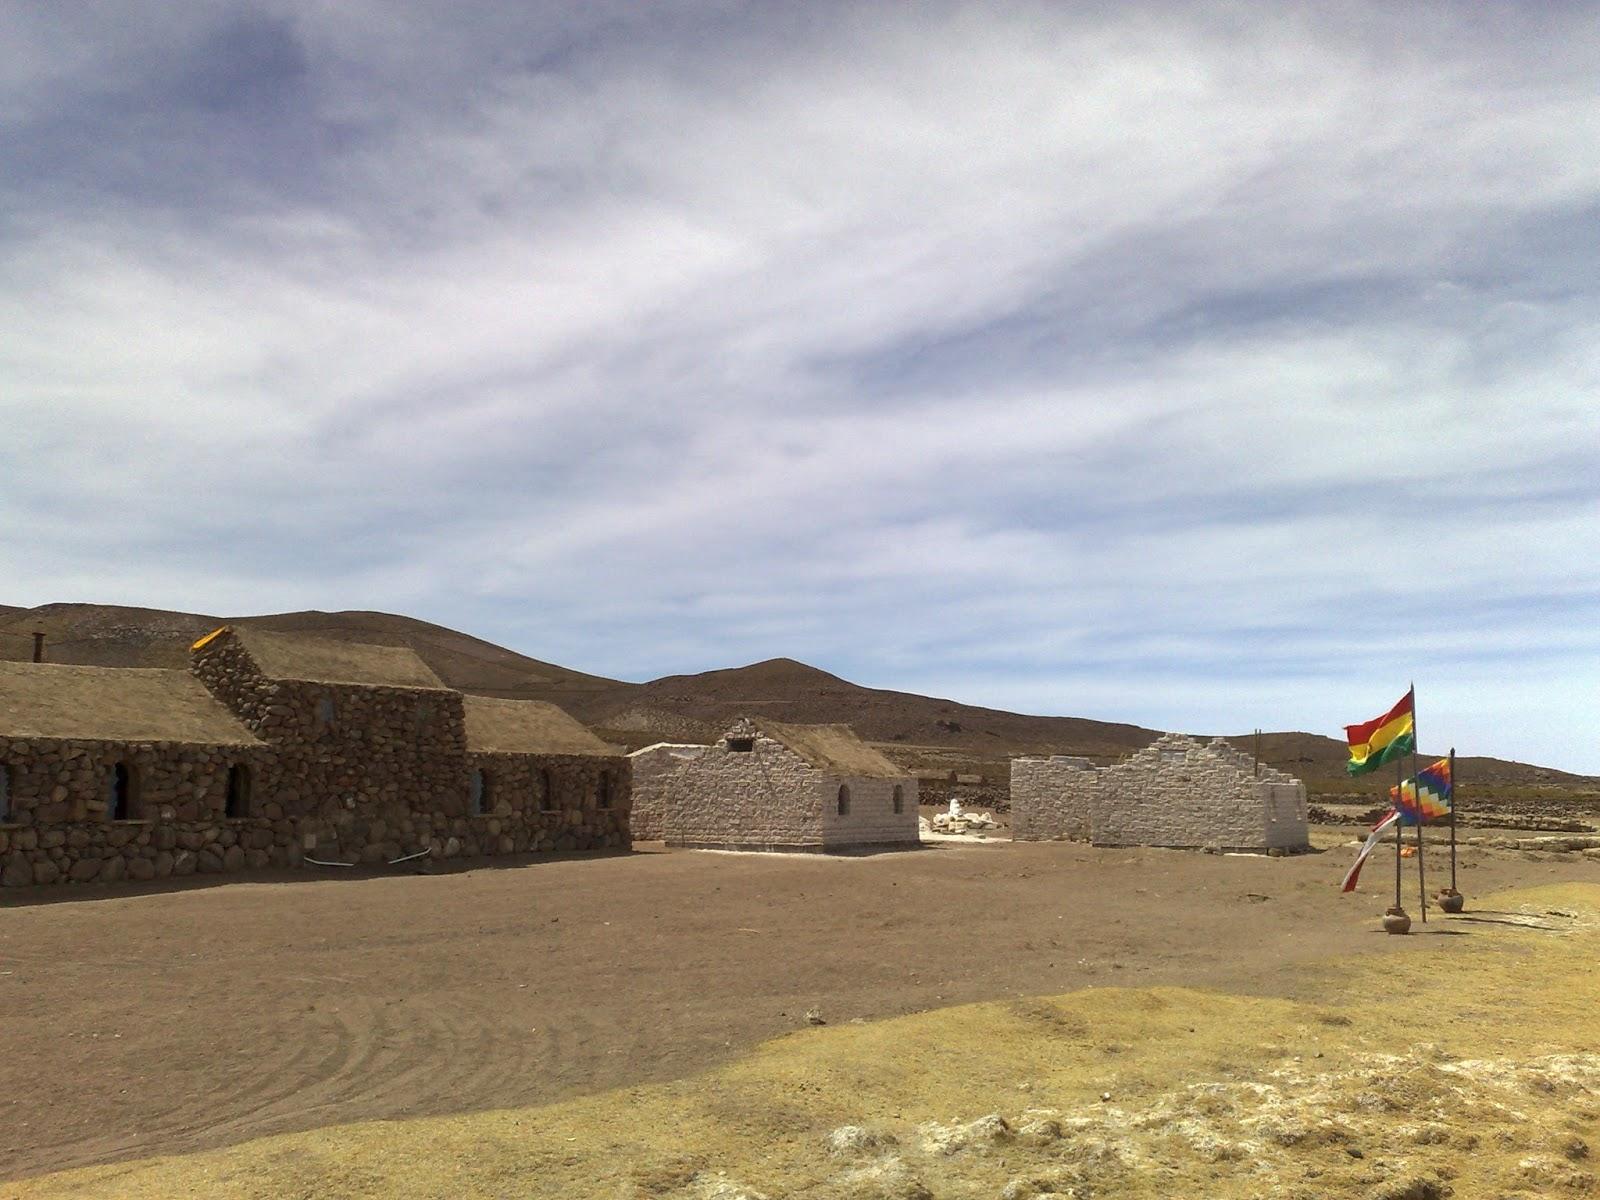 06 08092011782 - AVENTURA: SALAR DE UYUNI E LAGUNAS BOLIVIANAS VIA ACRE